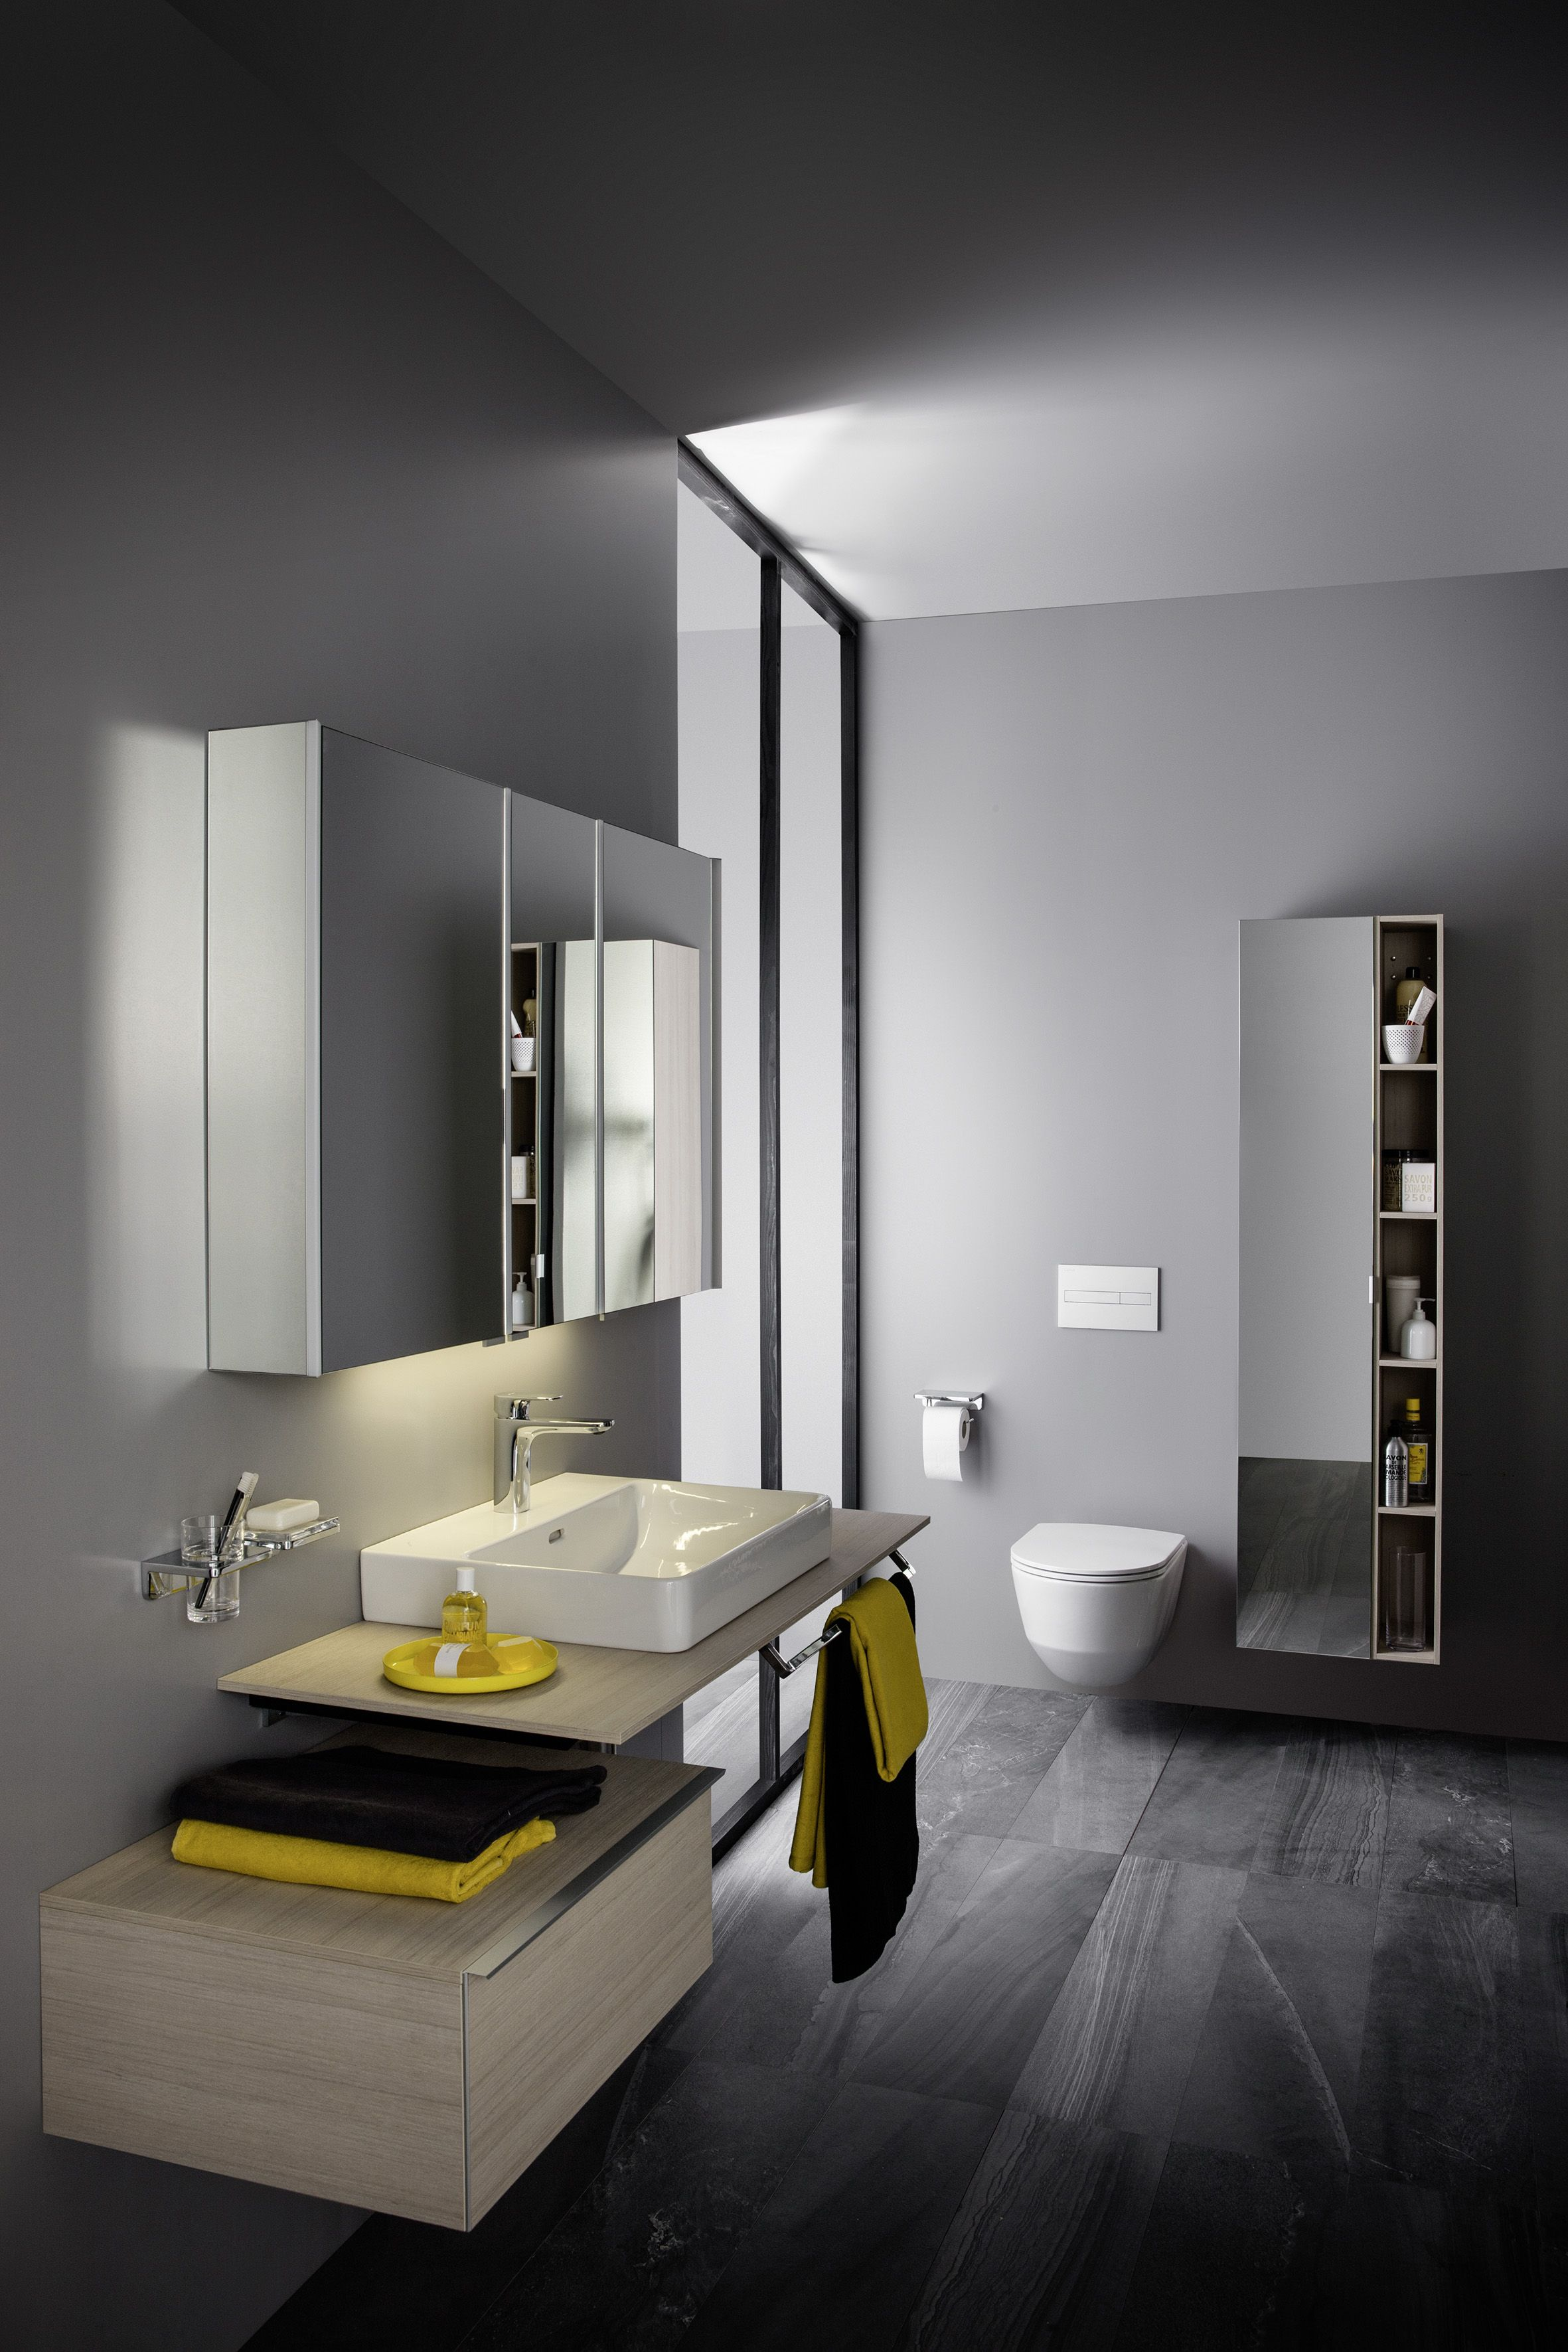 Mobilier De Salle De Bain Bois Clair SPACE De Laufen Plan Vasque - Plan sous vasque salle de bain